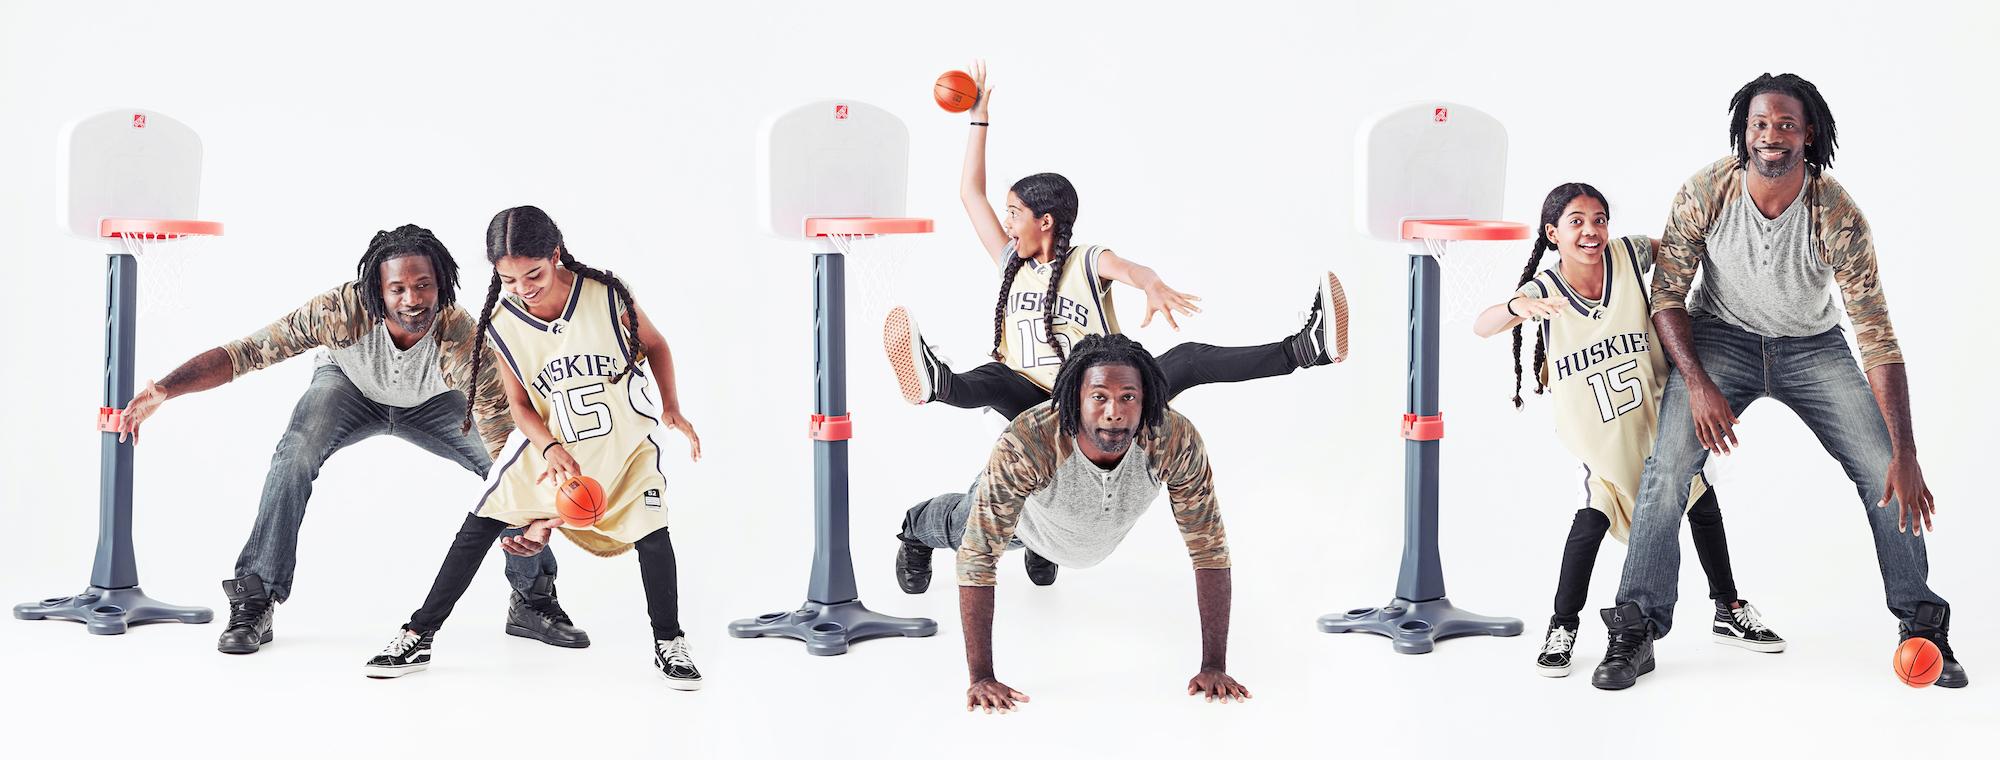 BOBBY JONES, nba, basketball, uw basketball, bobby jones basketball, bobby ray jones